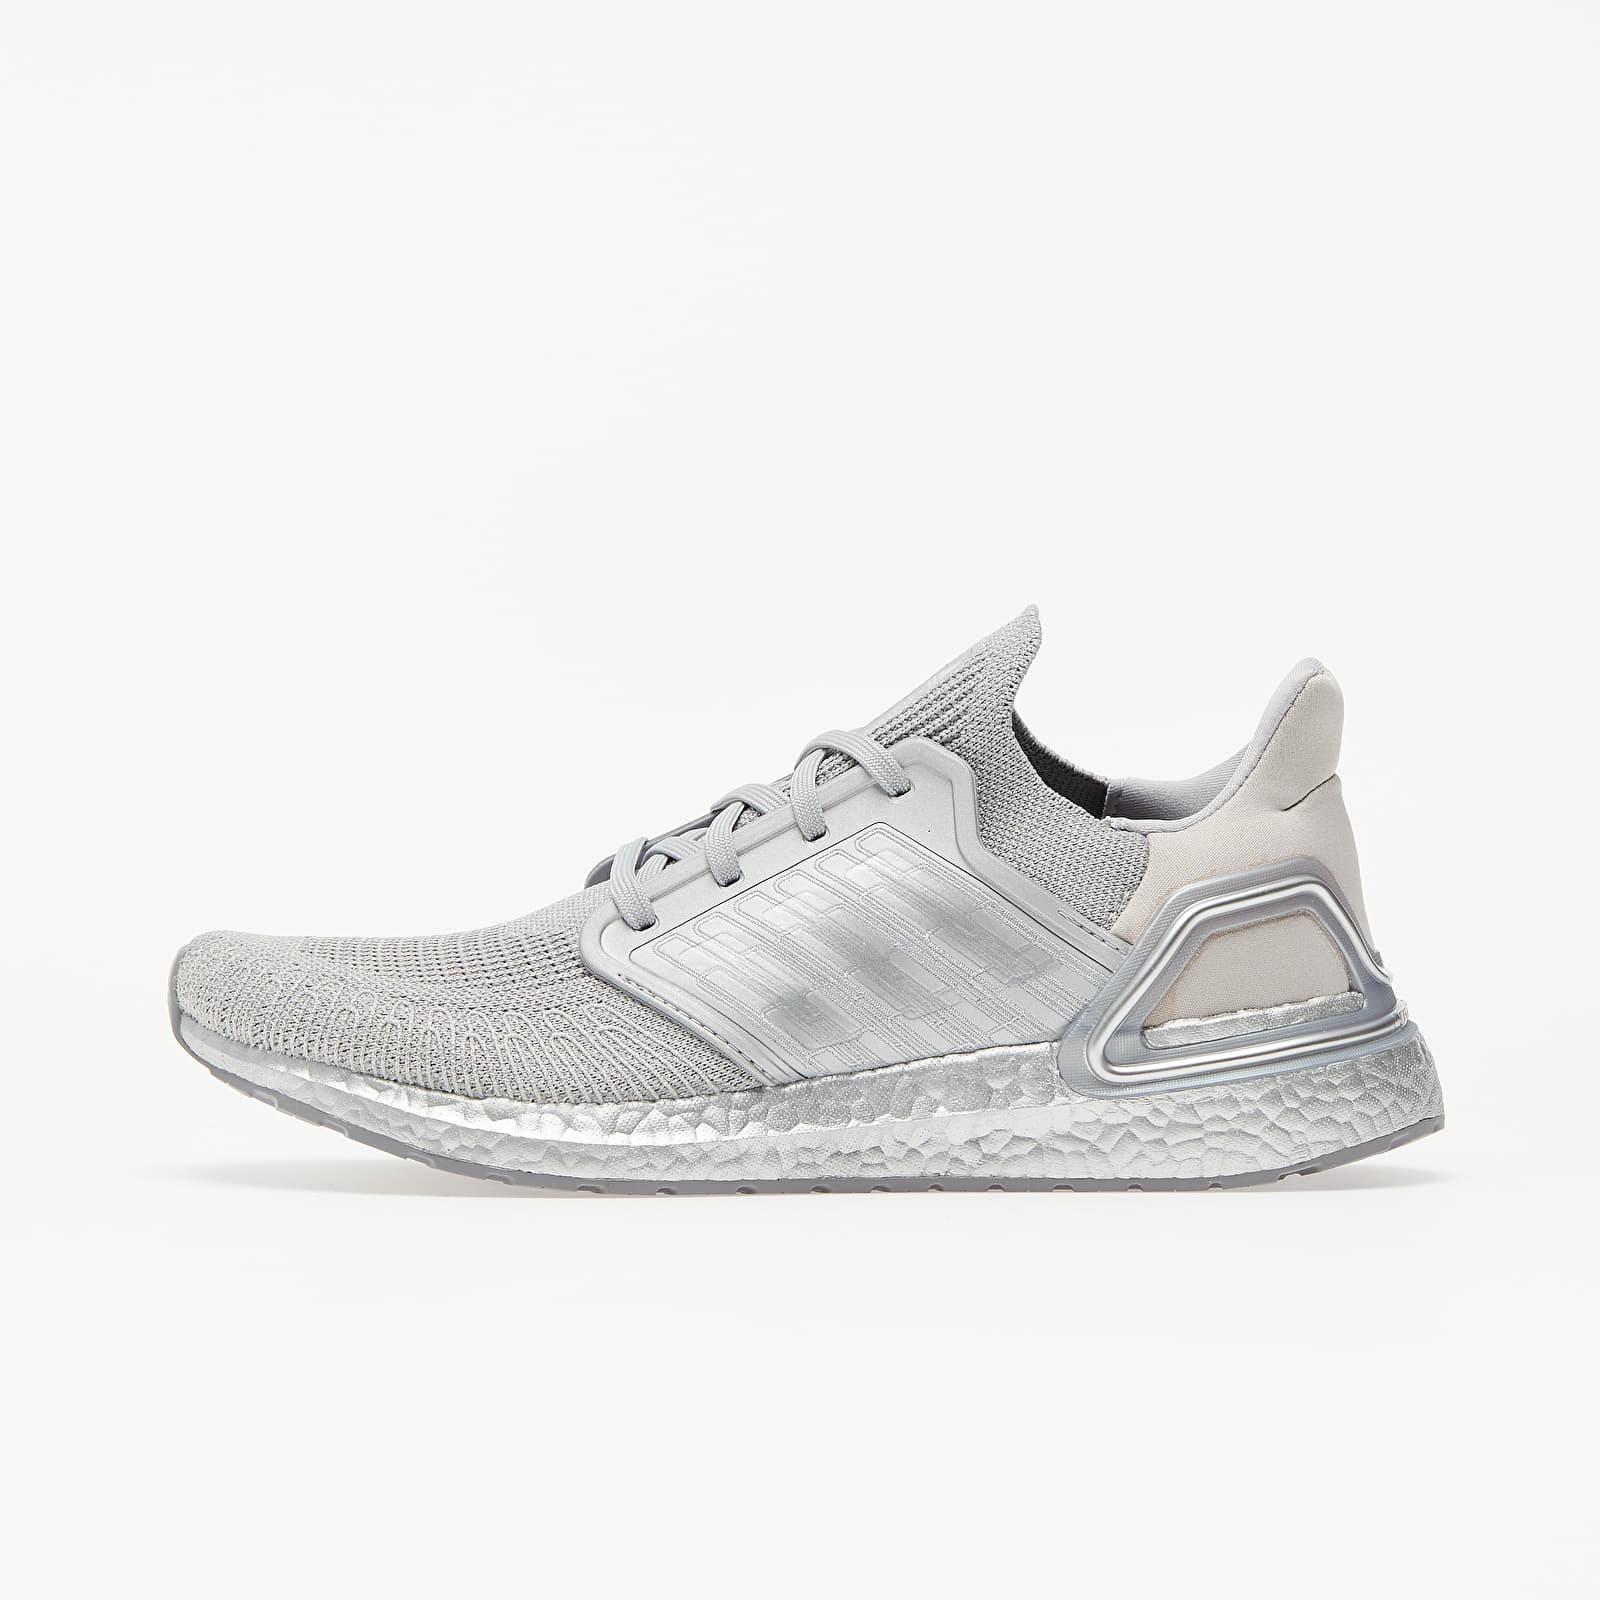 Men's shoes adidas UltraBOOST 20 Silver Metalic/ Silver Metalic/ Silver Metalic